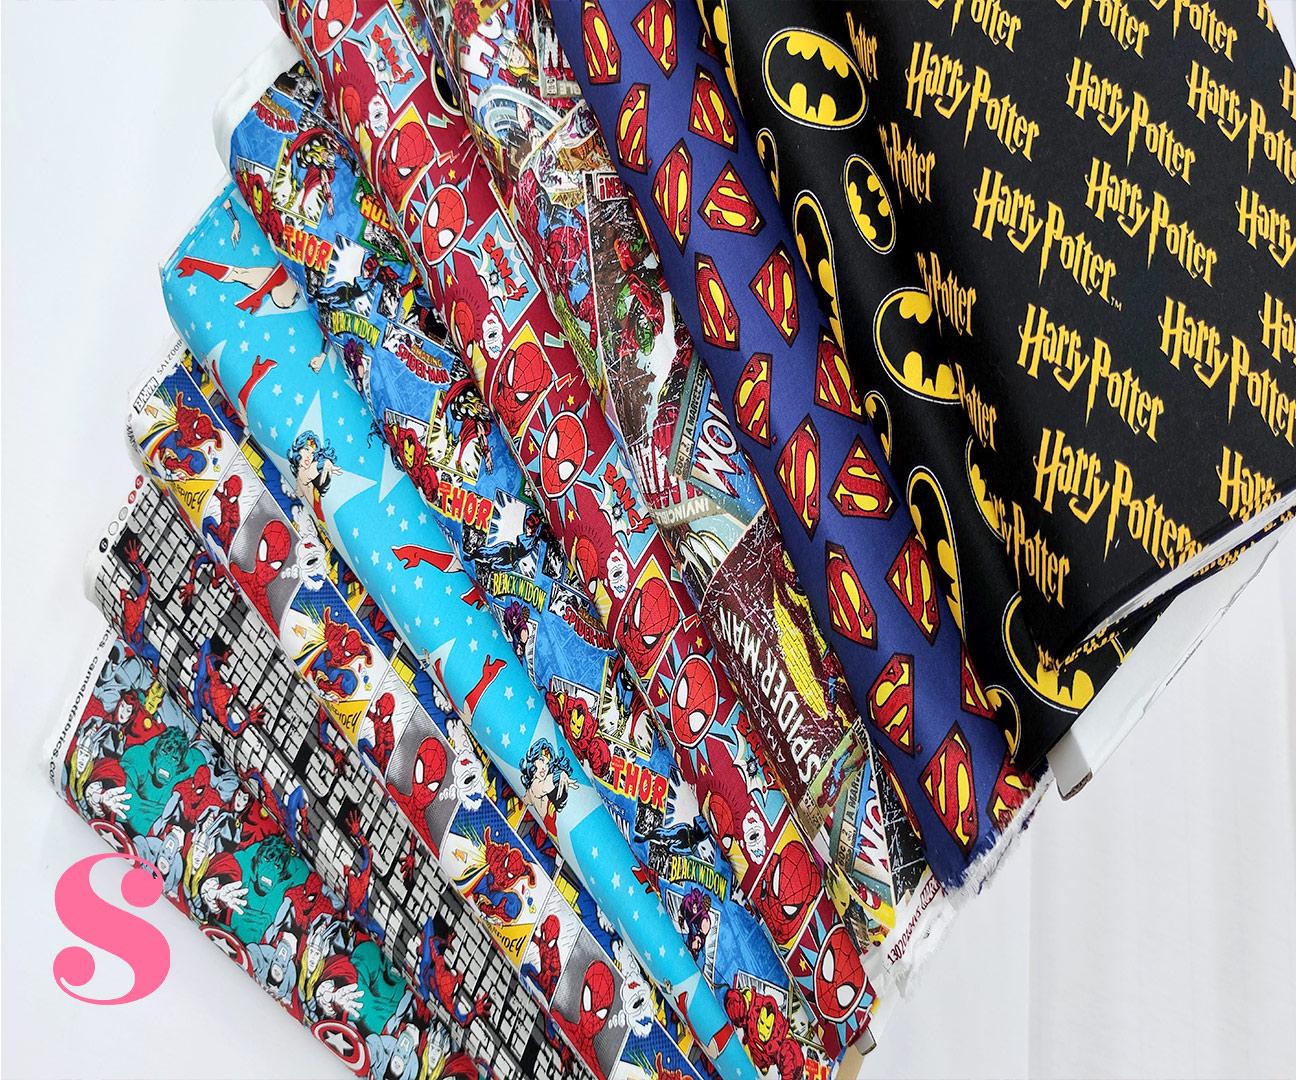 597-comic-spiderman-telaraña-america-otoño-invierno-tejidos-algodón-estampado-percal,telas super héroes,telas frikis,Tejido Estampado Spiderman Power Patch Americano